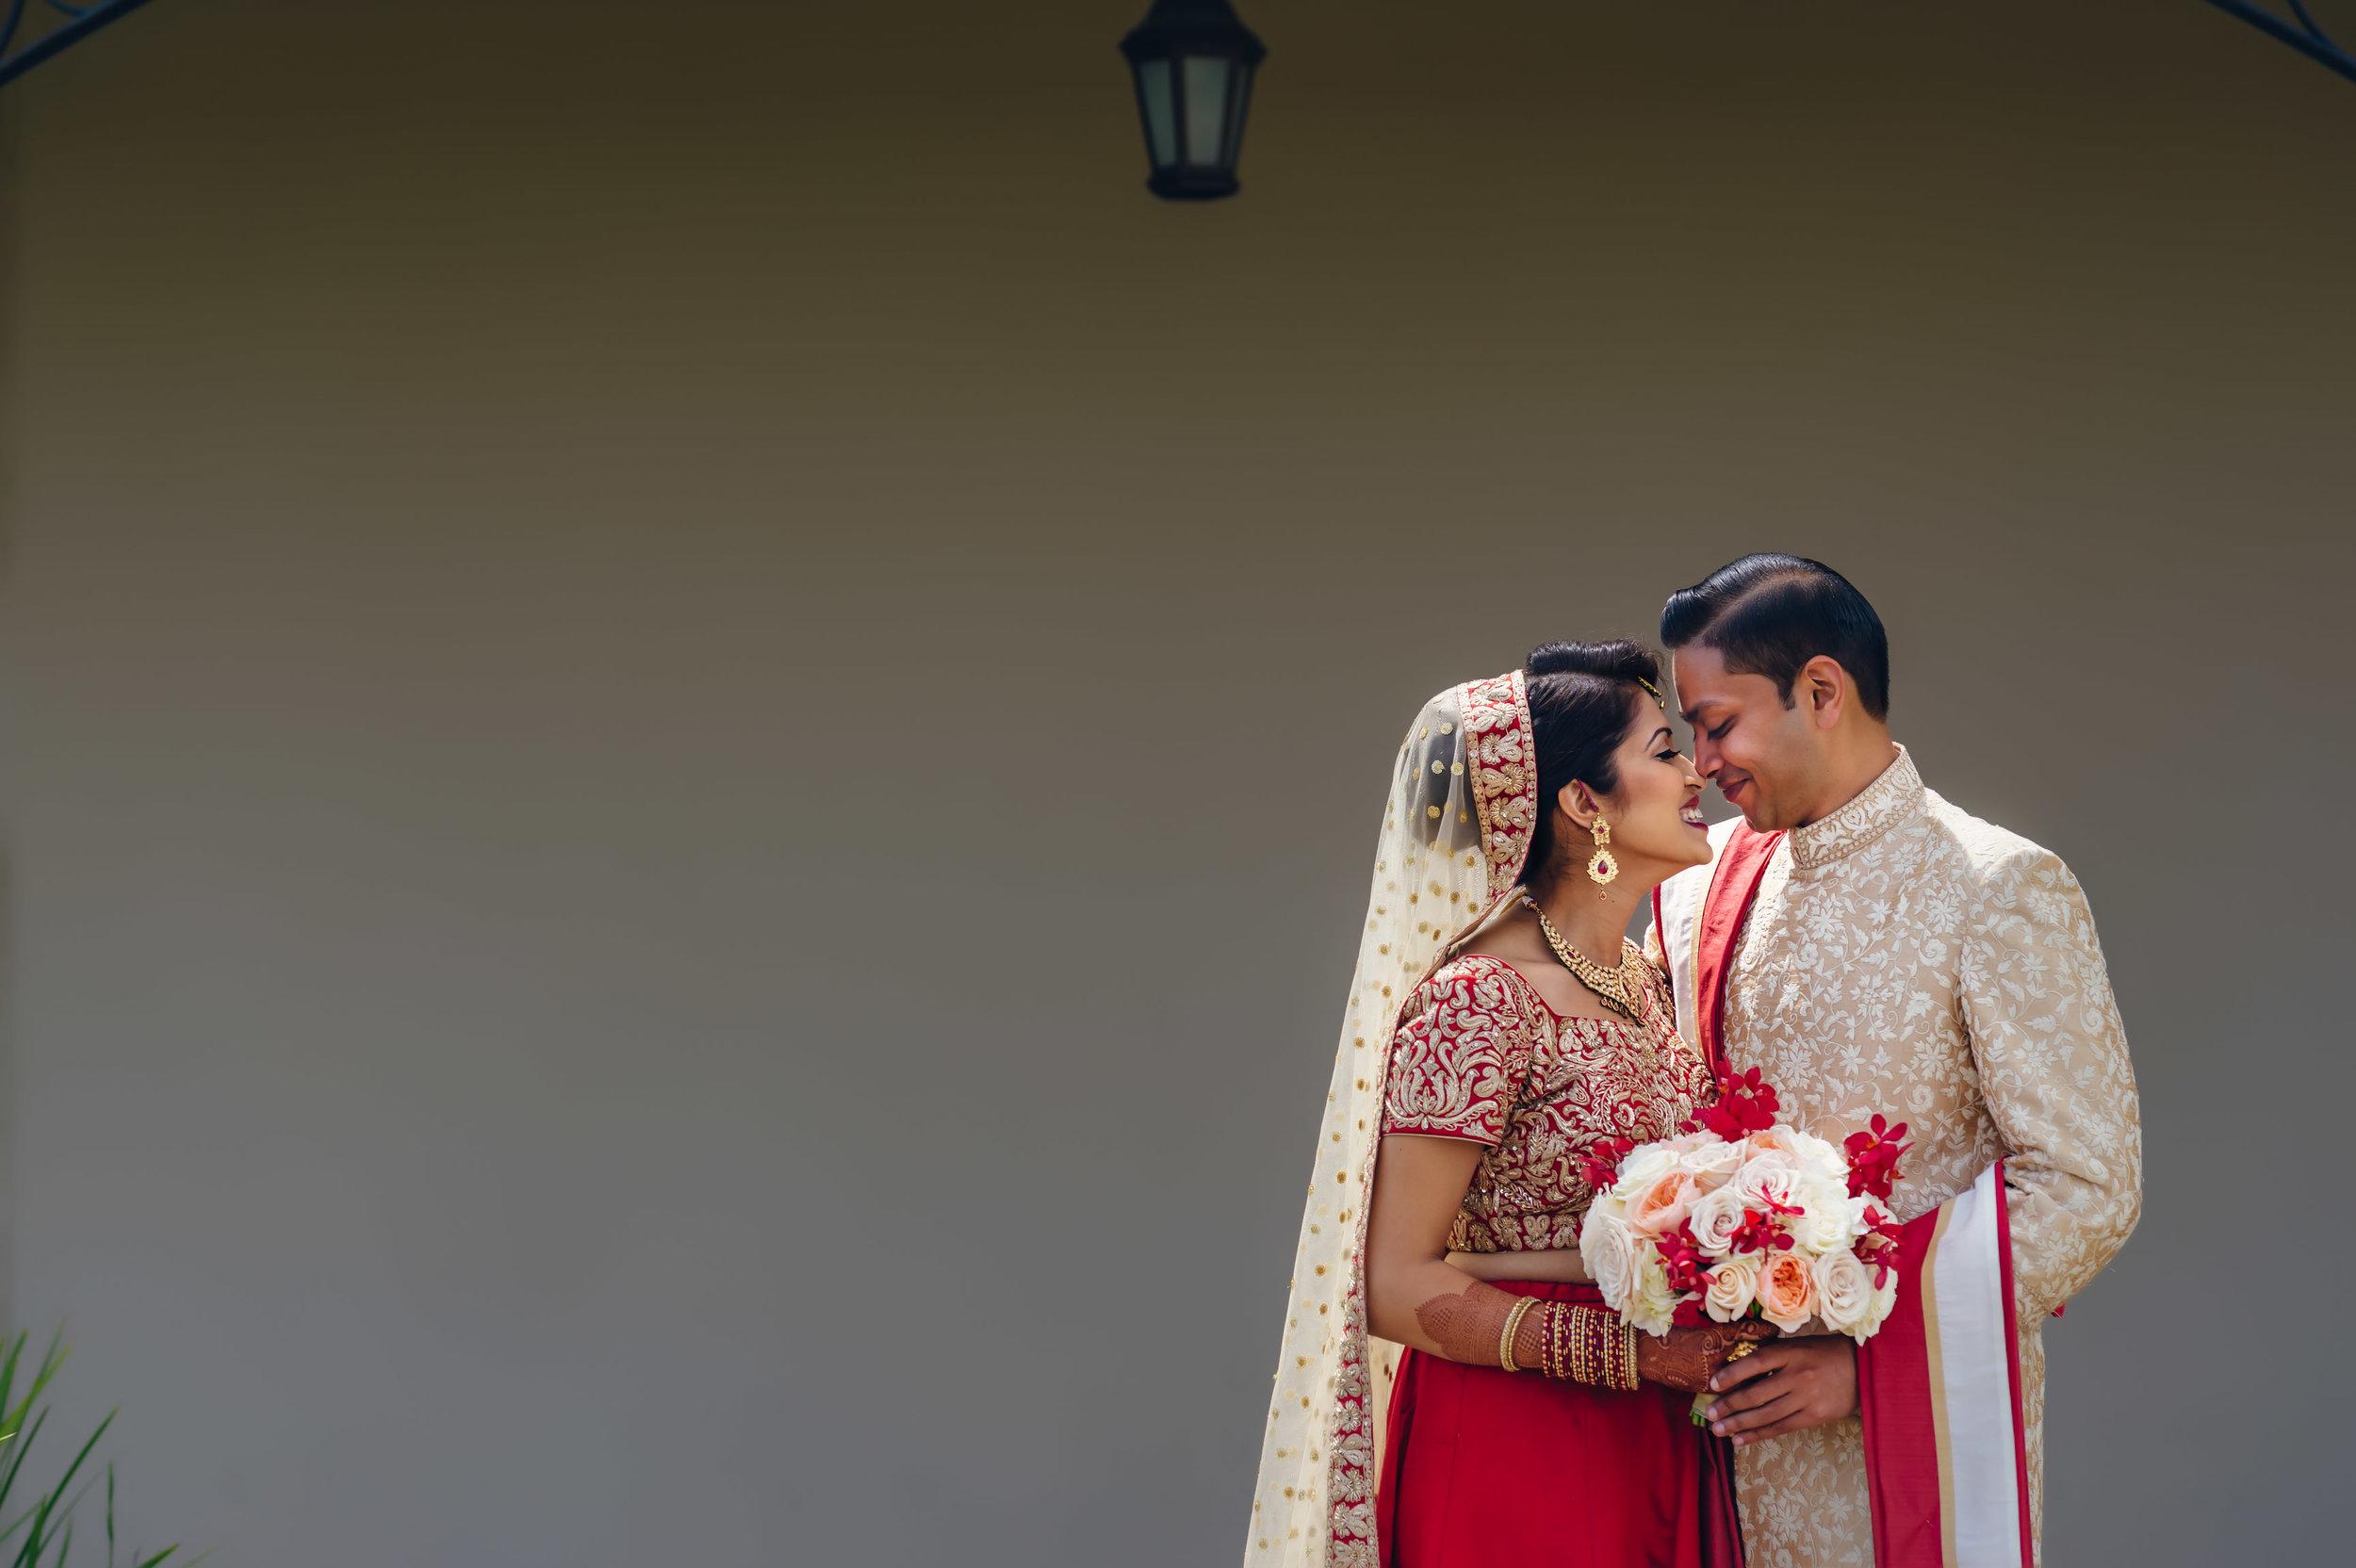 CASA REAL RUBY HILL WINERY INDIAN HINDU WEDDING - RIJUL & AASTHA